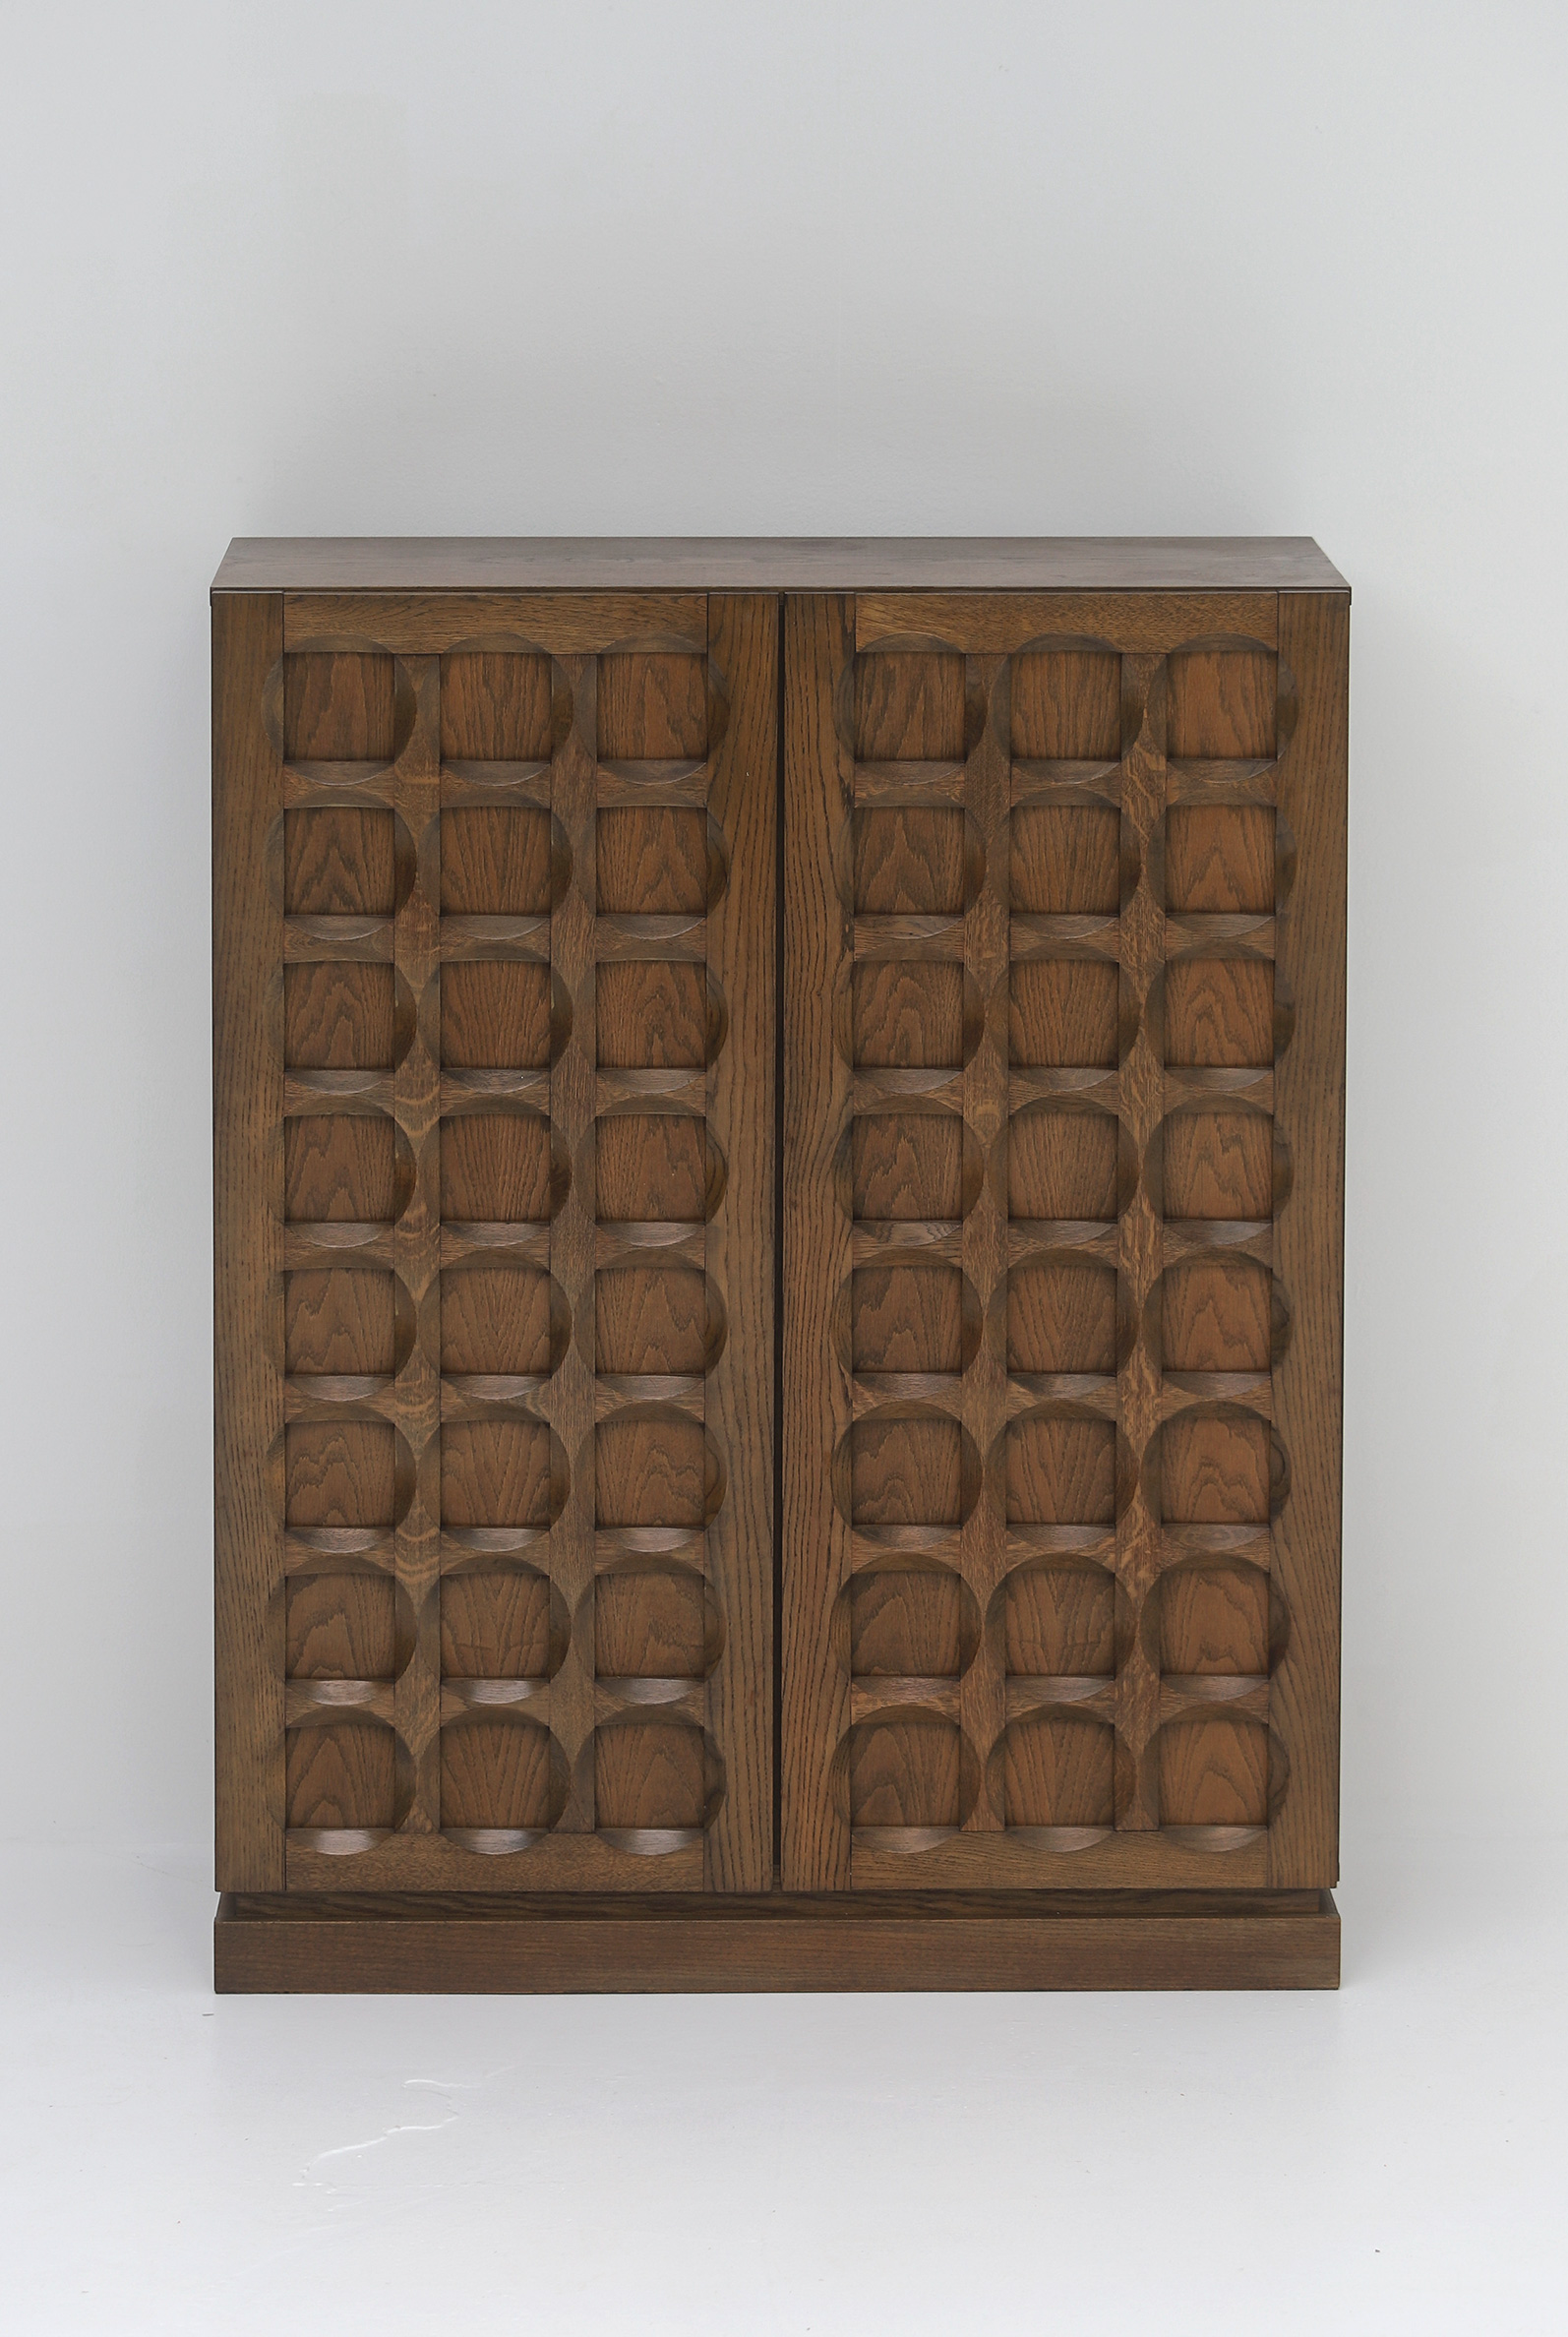 1970s Defour Cabinet Graphical Door Panels image 13